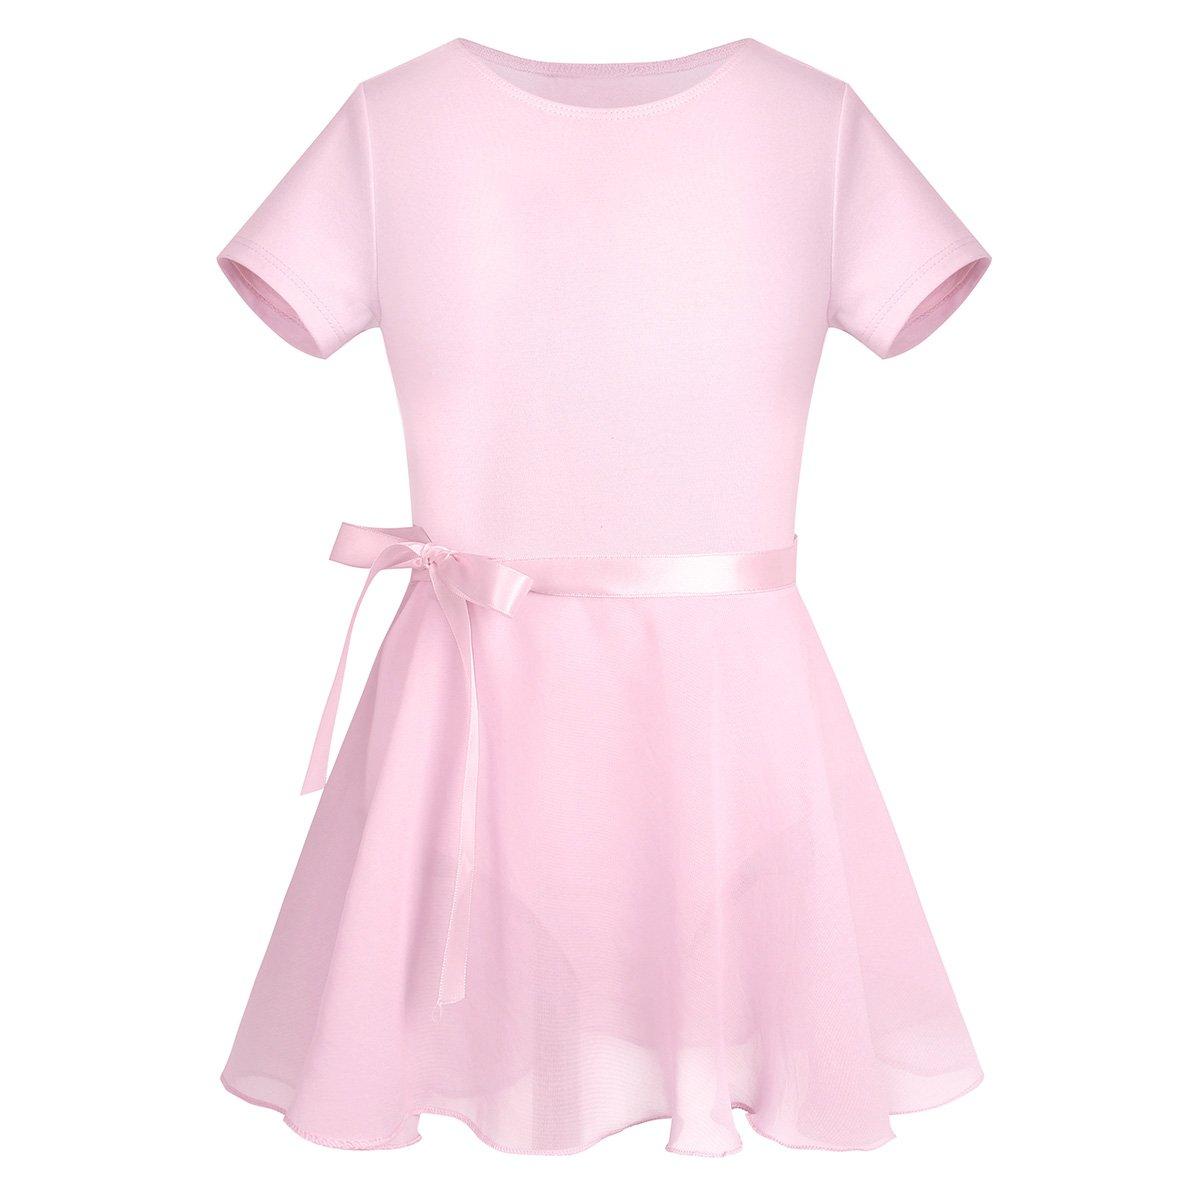 Girls Age 11 White Leotard Dress Chiffon Skirt Dance Gymnastics Ballet